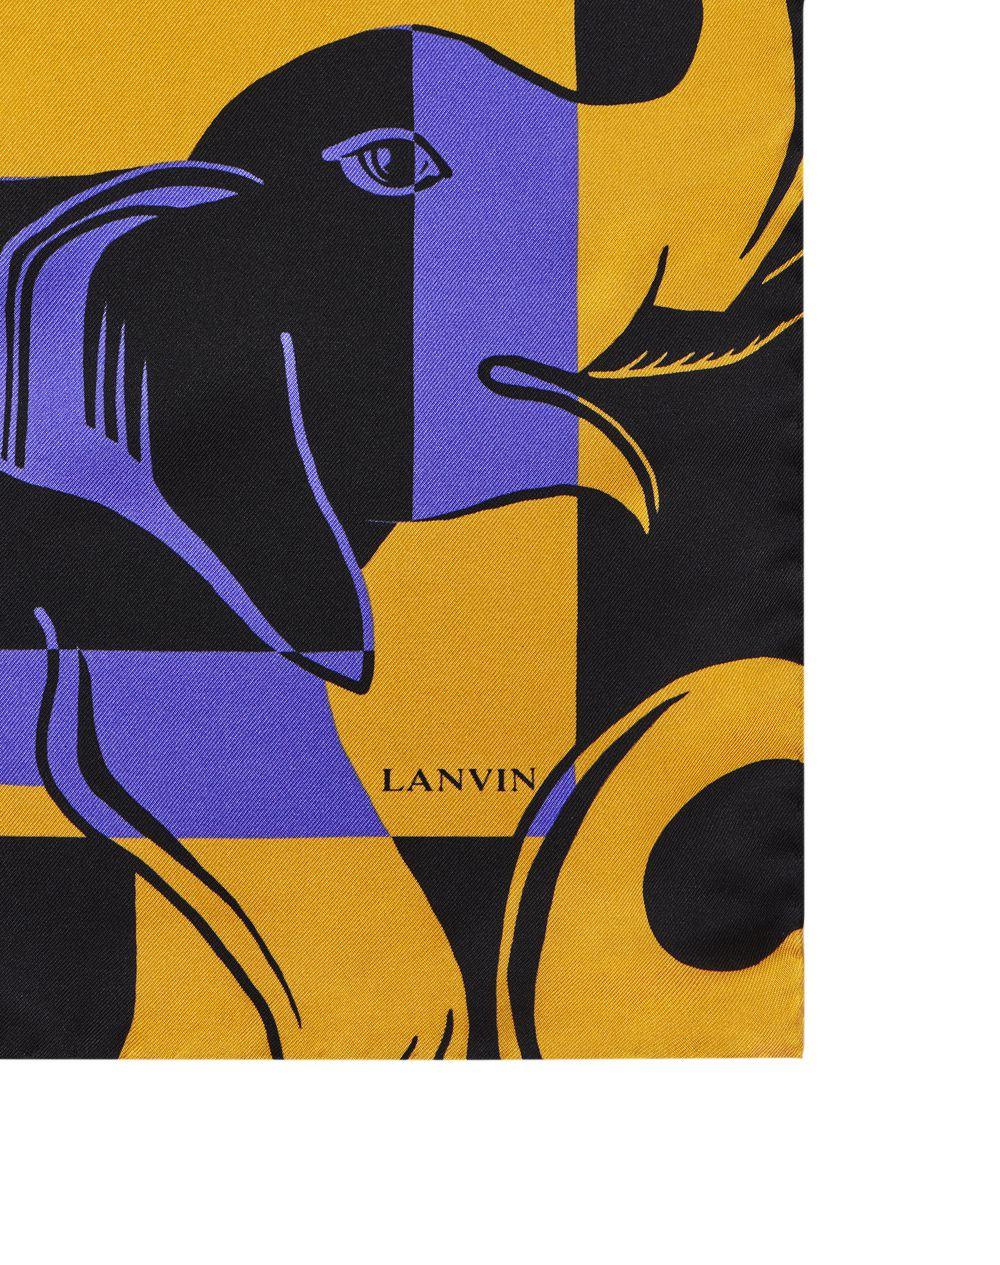 ELEPHANT-PRINT SILK SCARF  - Lanvin